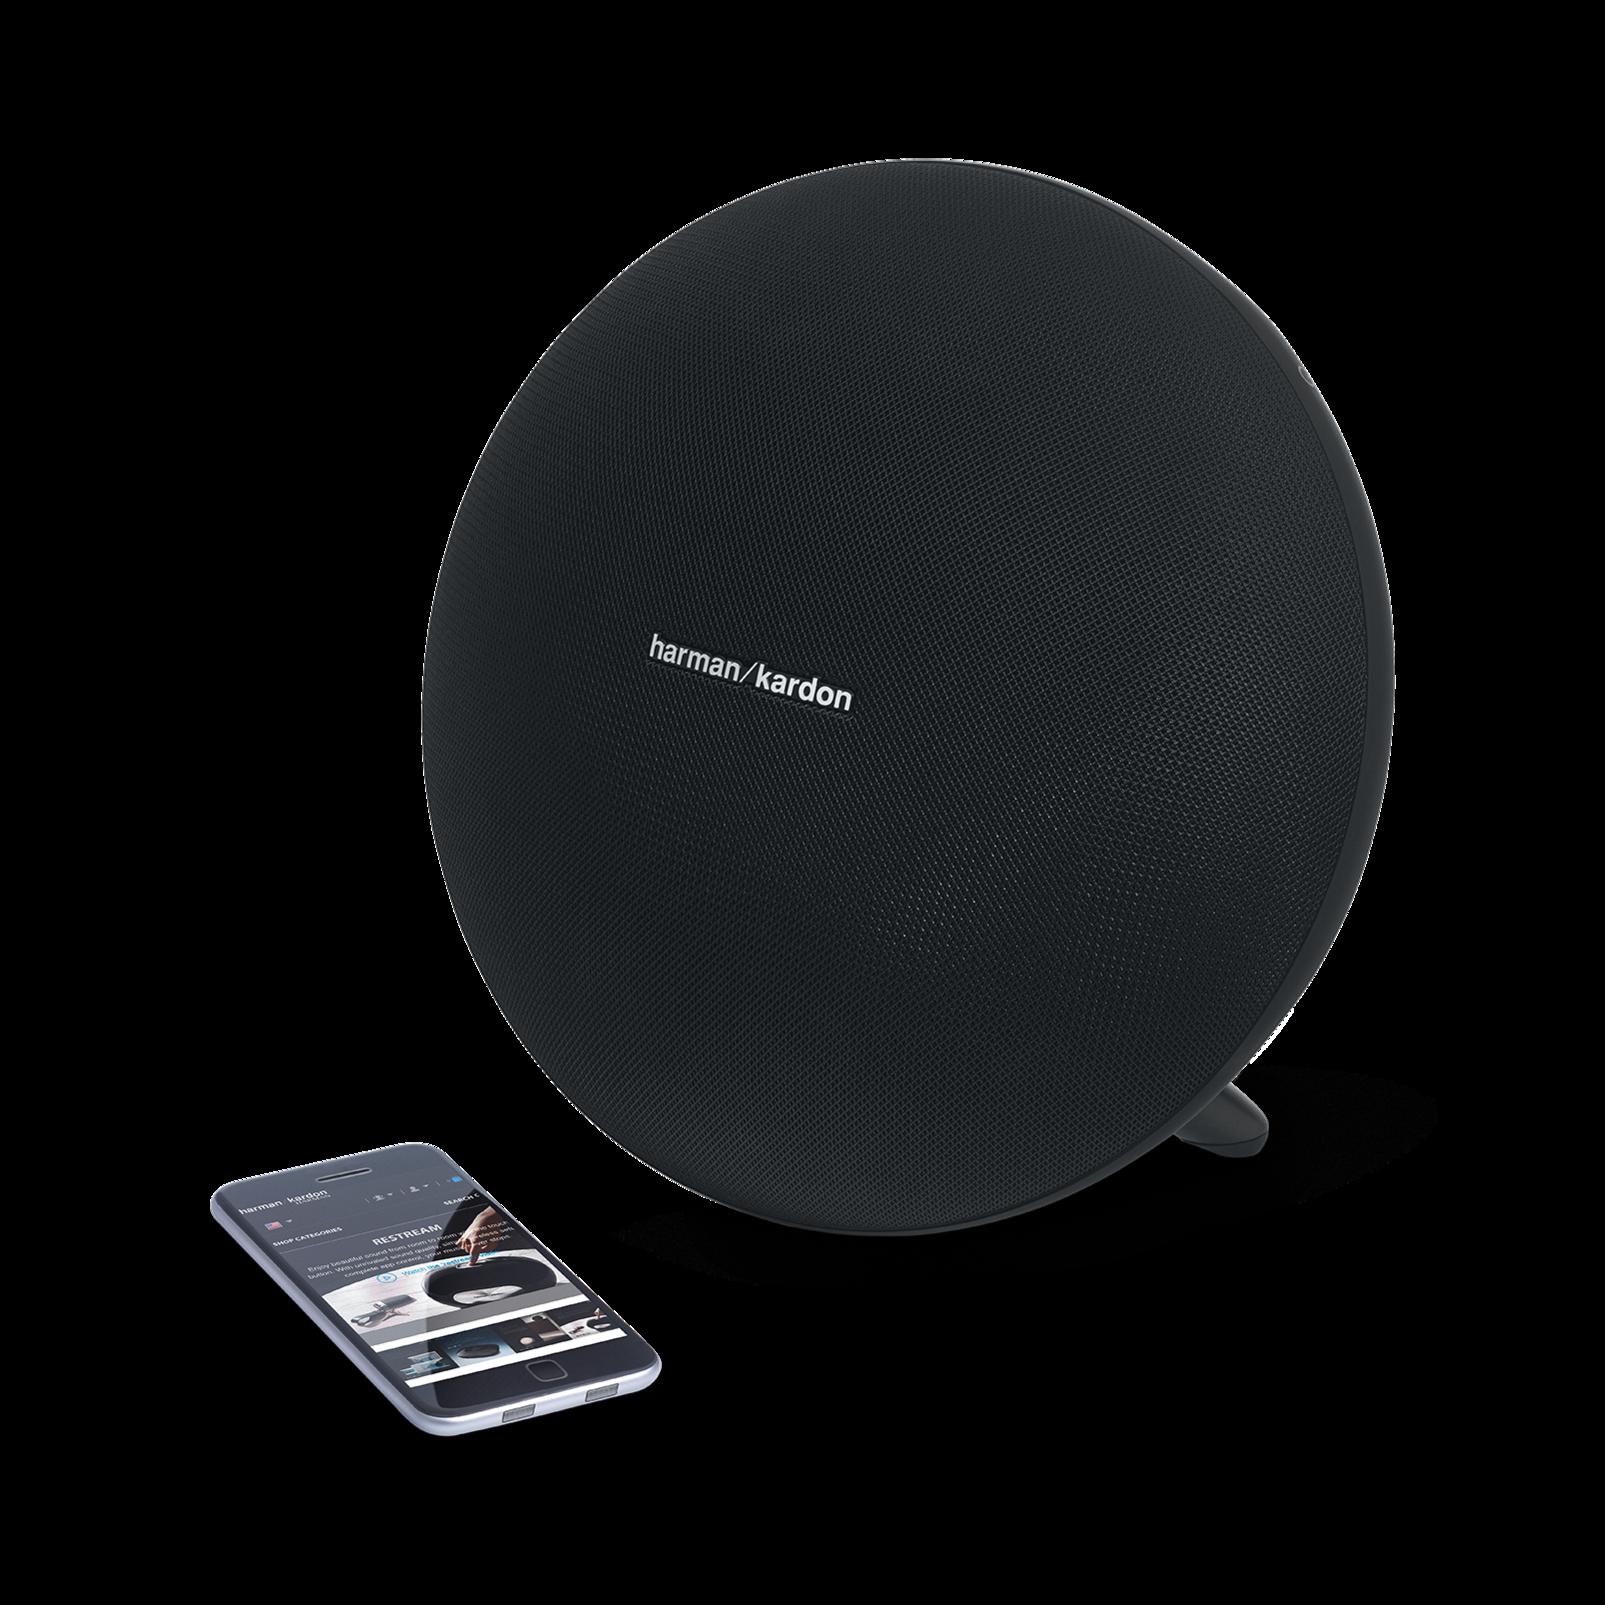 Onyx Studio 3 - Black - Portable Bluetooth Speaker - Detailshot 1